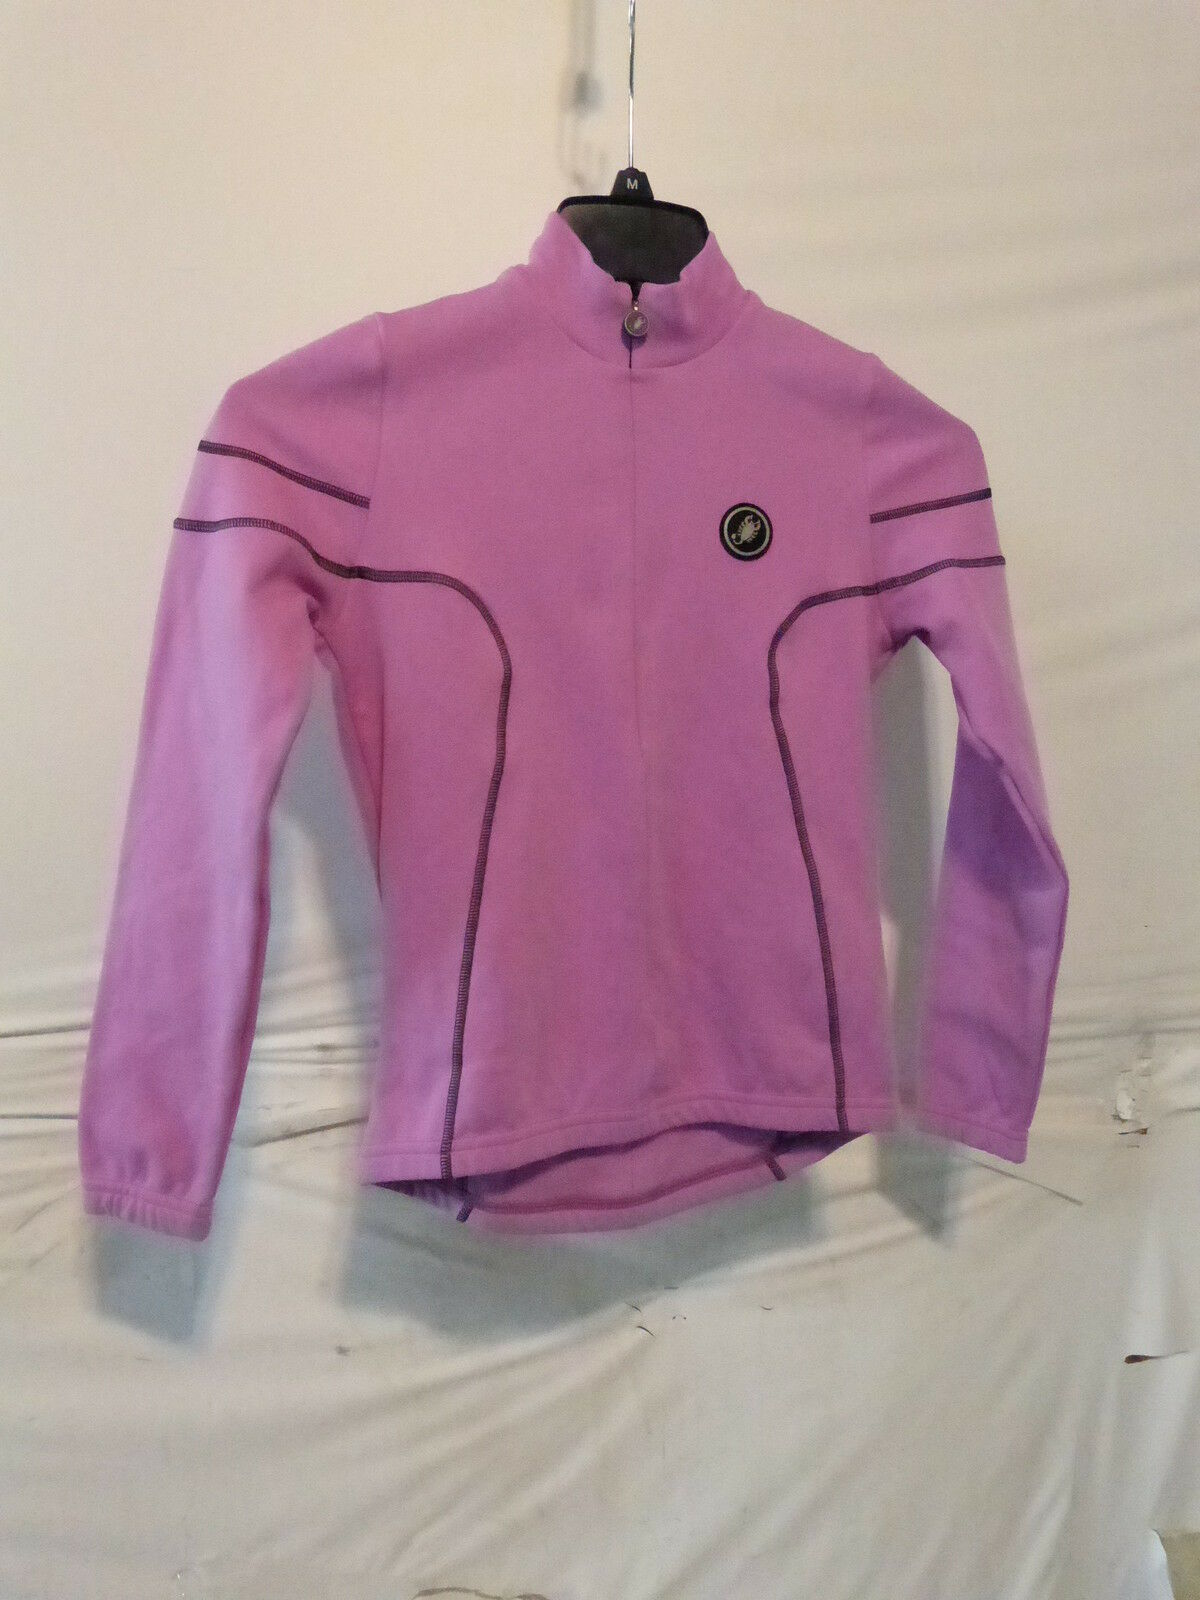 Castelli Women's purplec Full Zip LS Cycling Jersey, Size Small